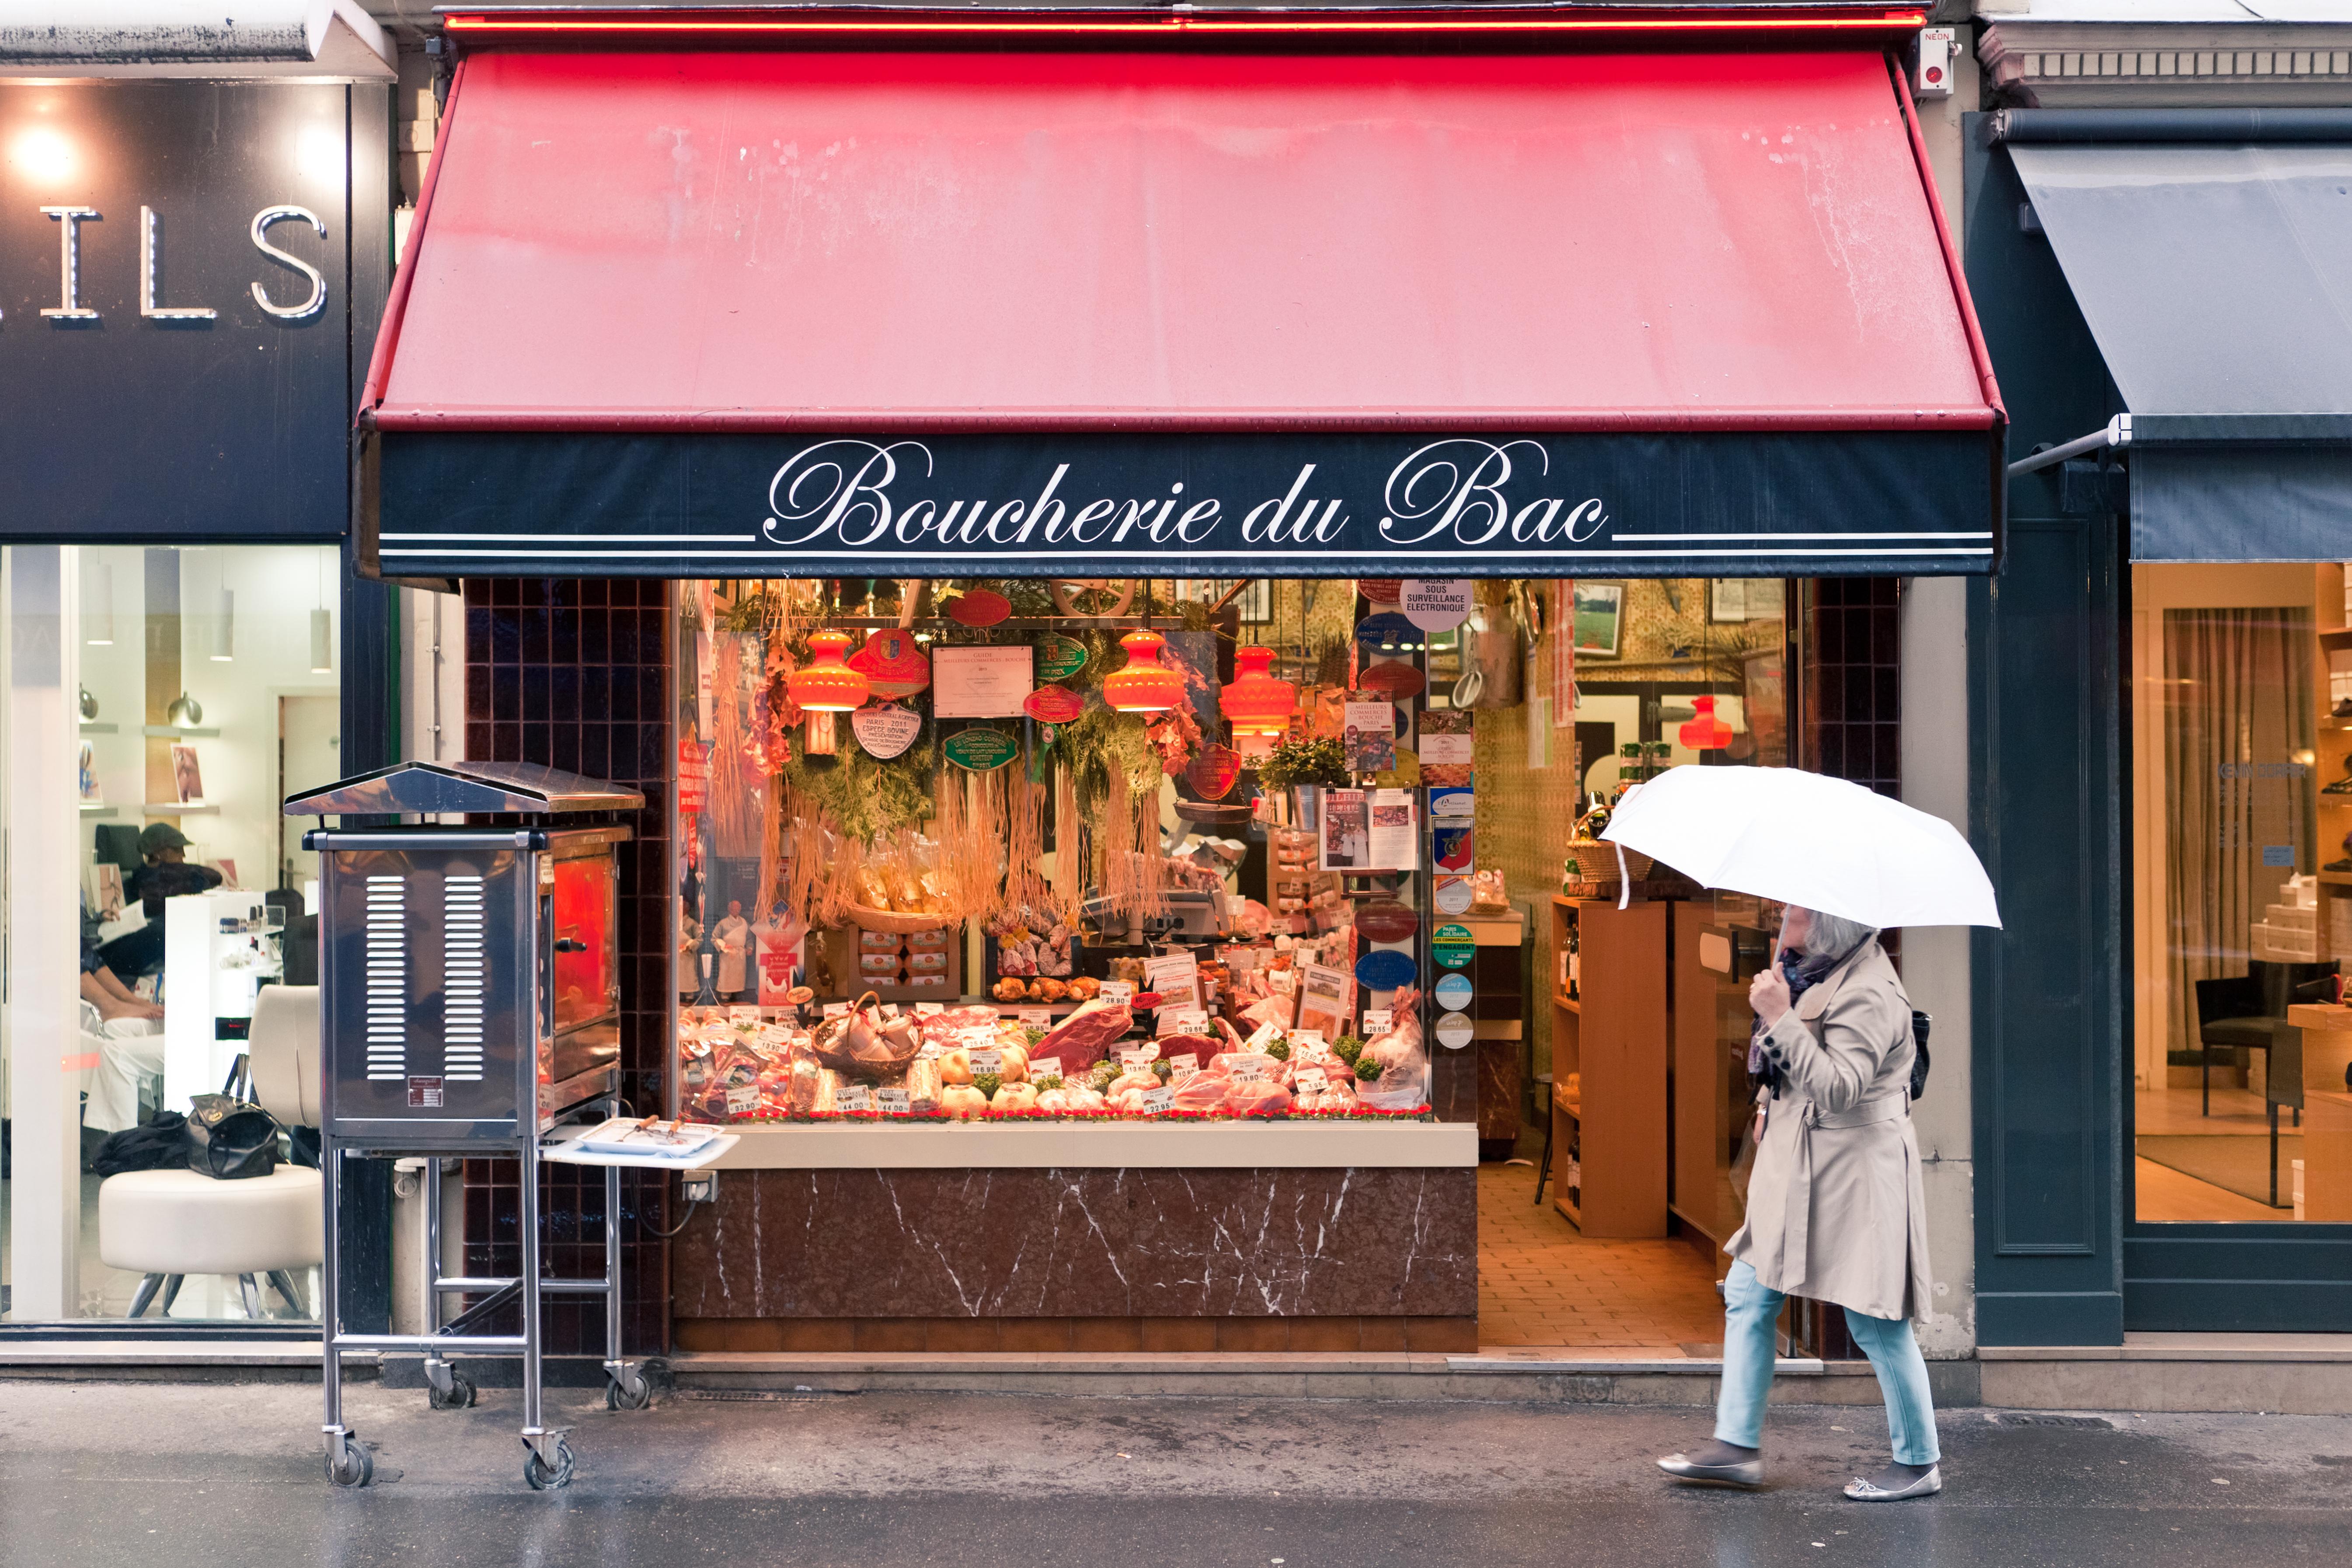 Restaurant Du Bac  Ef Bf Bd Jumi Ef Bf Bdges R Ef Bf Bdveillon De La Saint Sylvestre